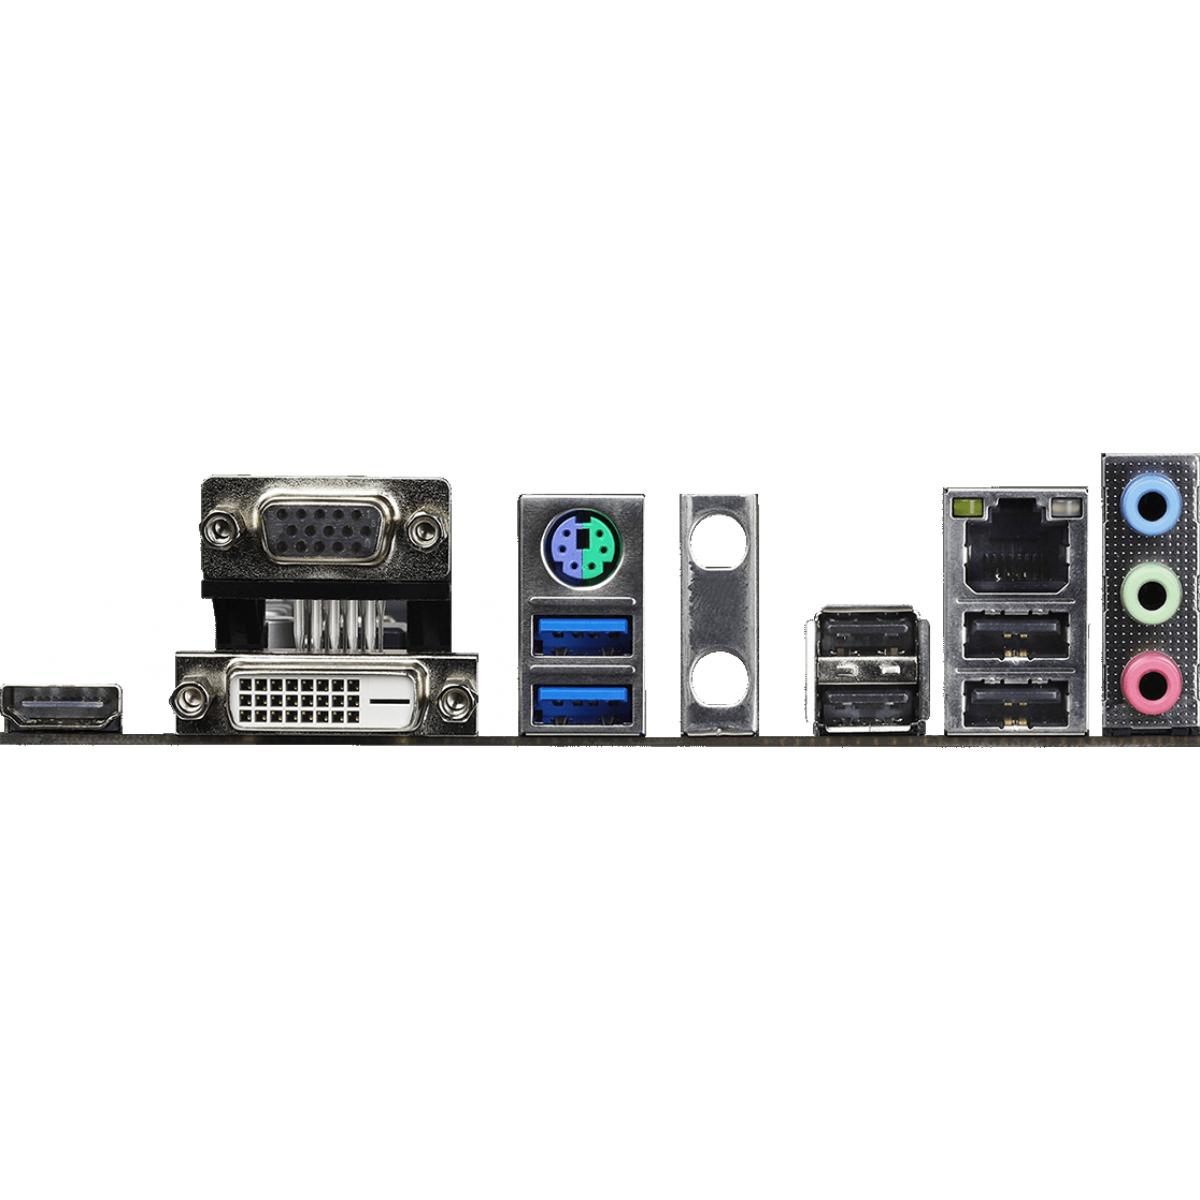 Placa Mãe Asrock H410M-HDV/M.2, Chipset H410M, Intel LGA 1200, mAXT, DDR4